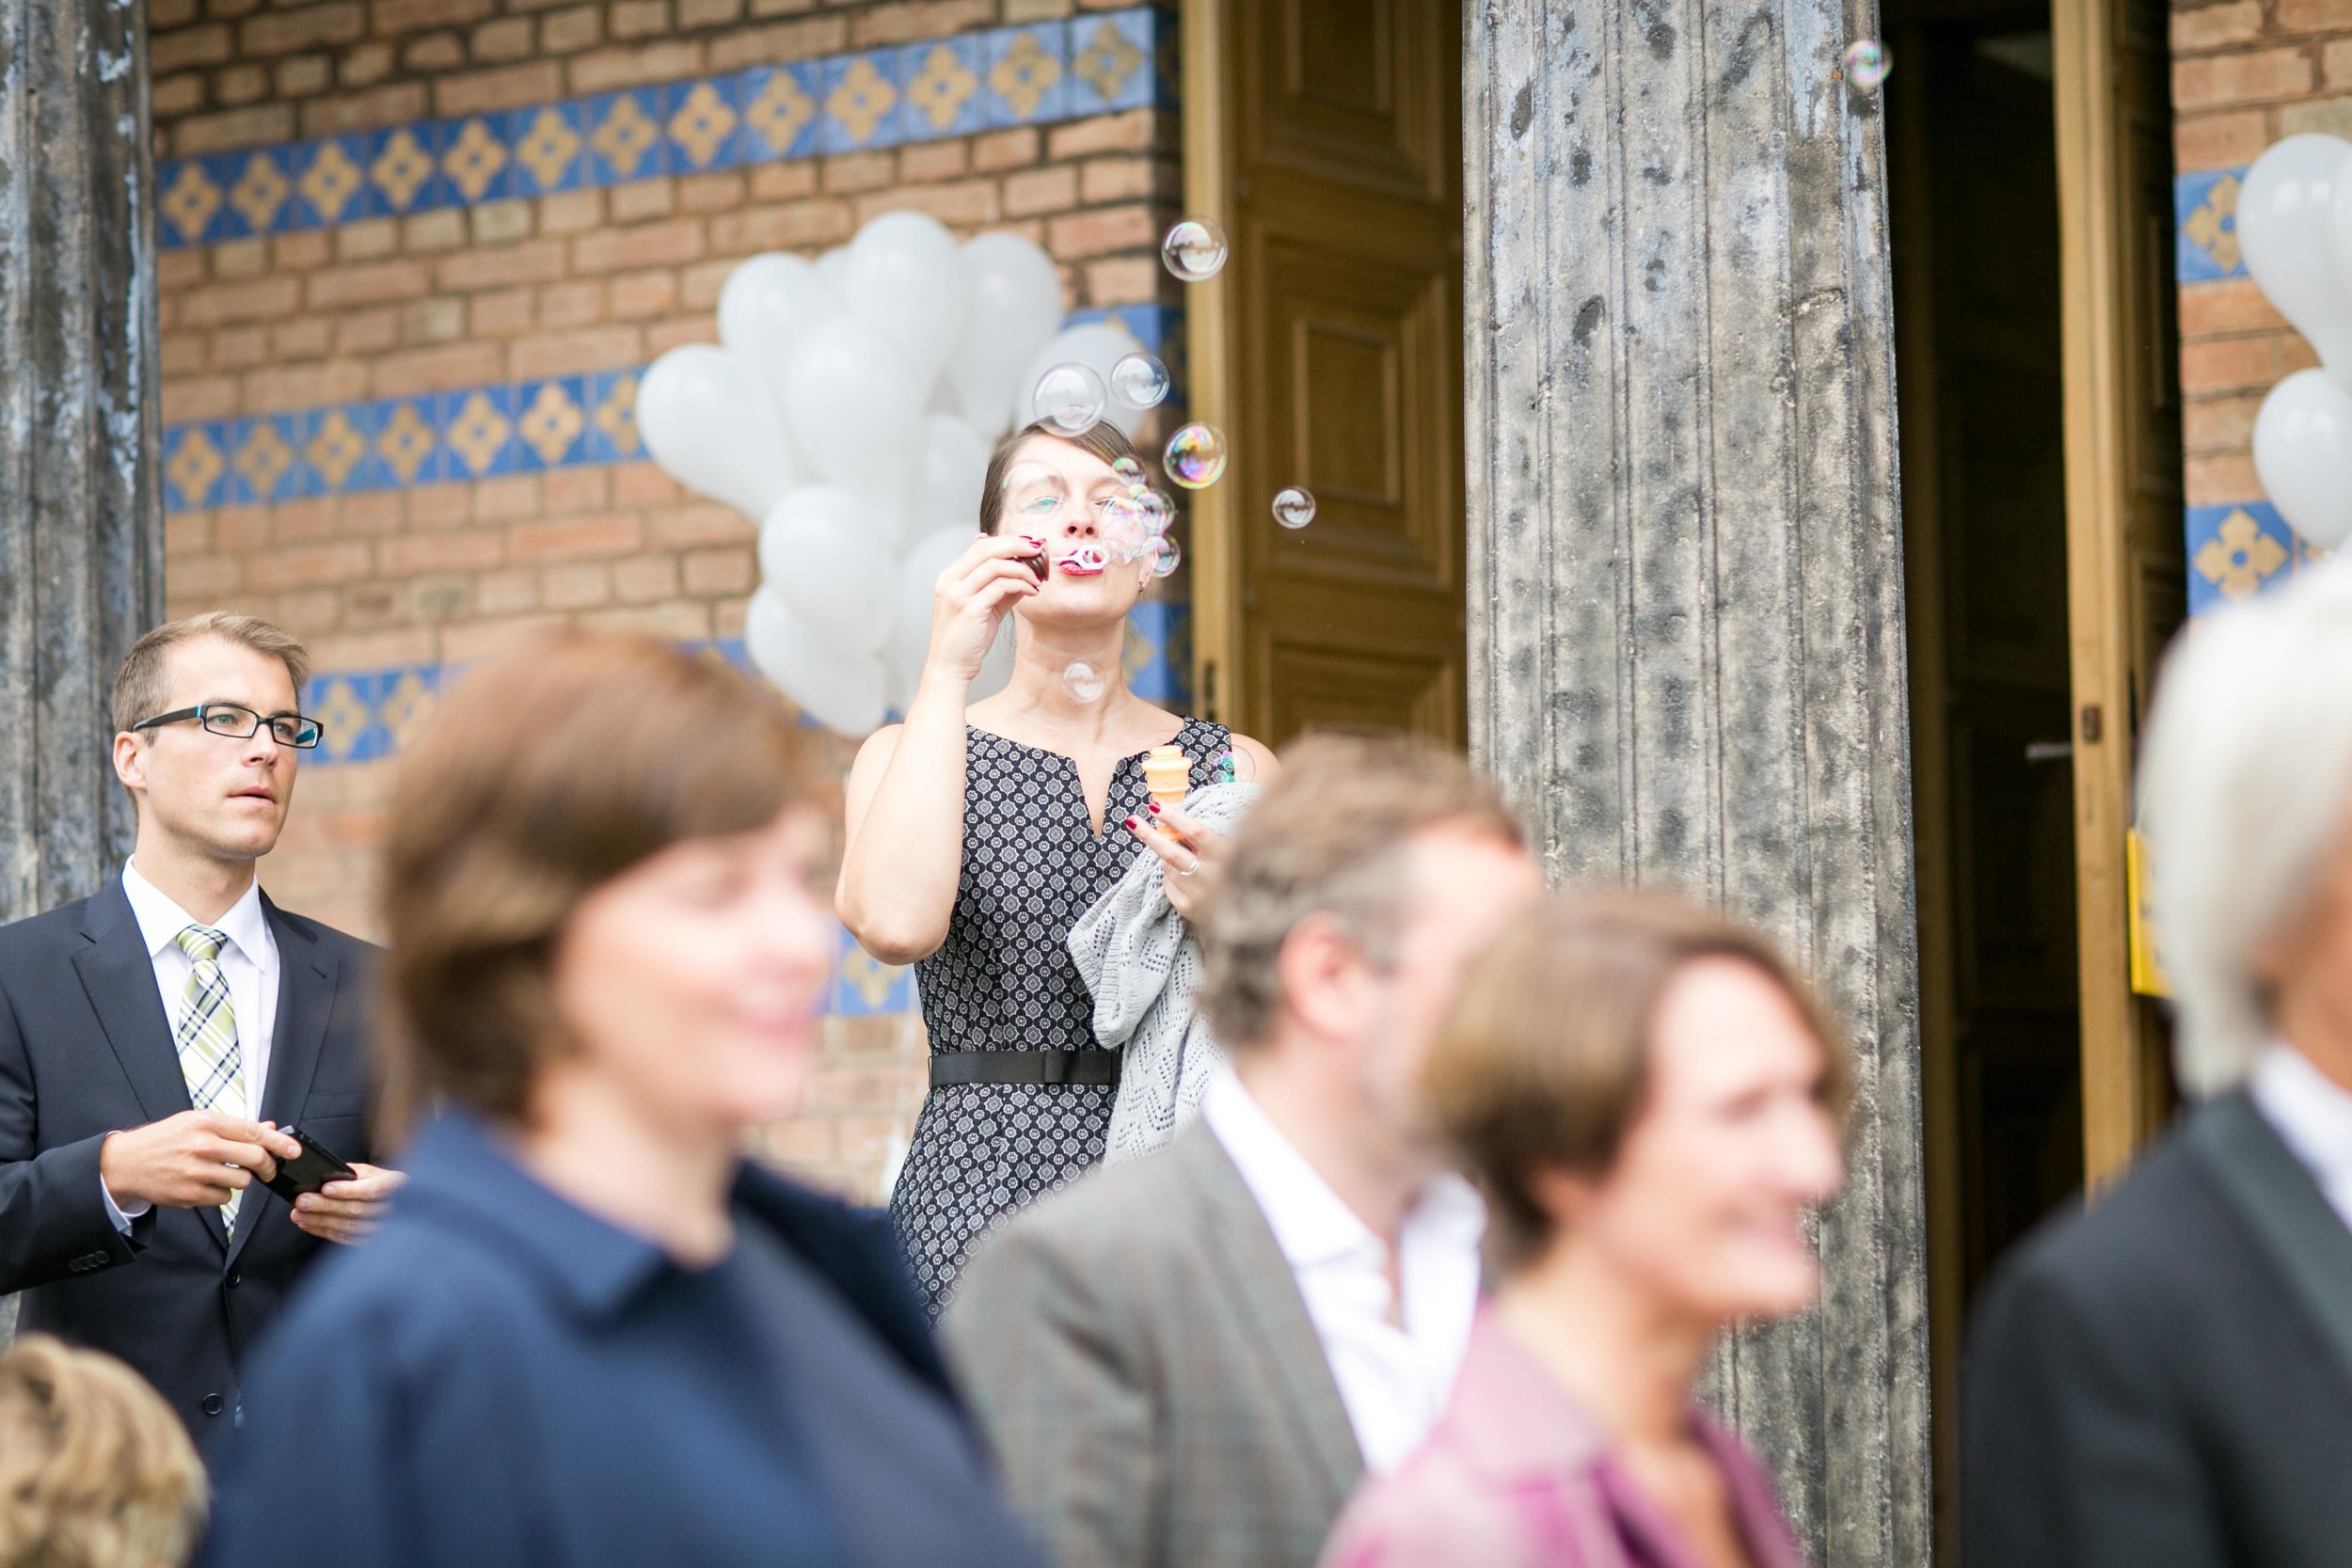 Michelberger Hotel Berlin Hochzeitsfotografie_Fran Burrows Fotografie-41.jpg